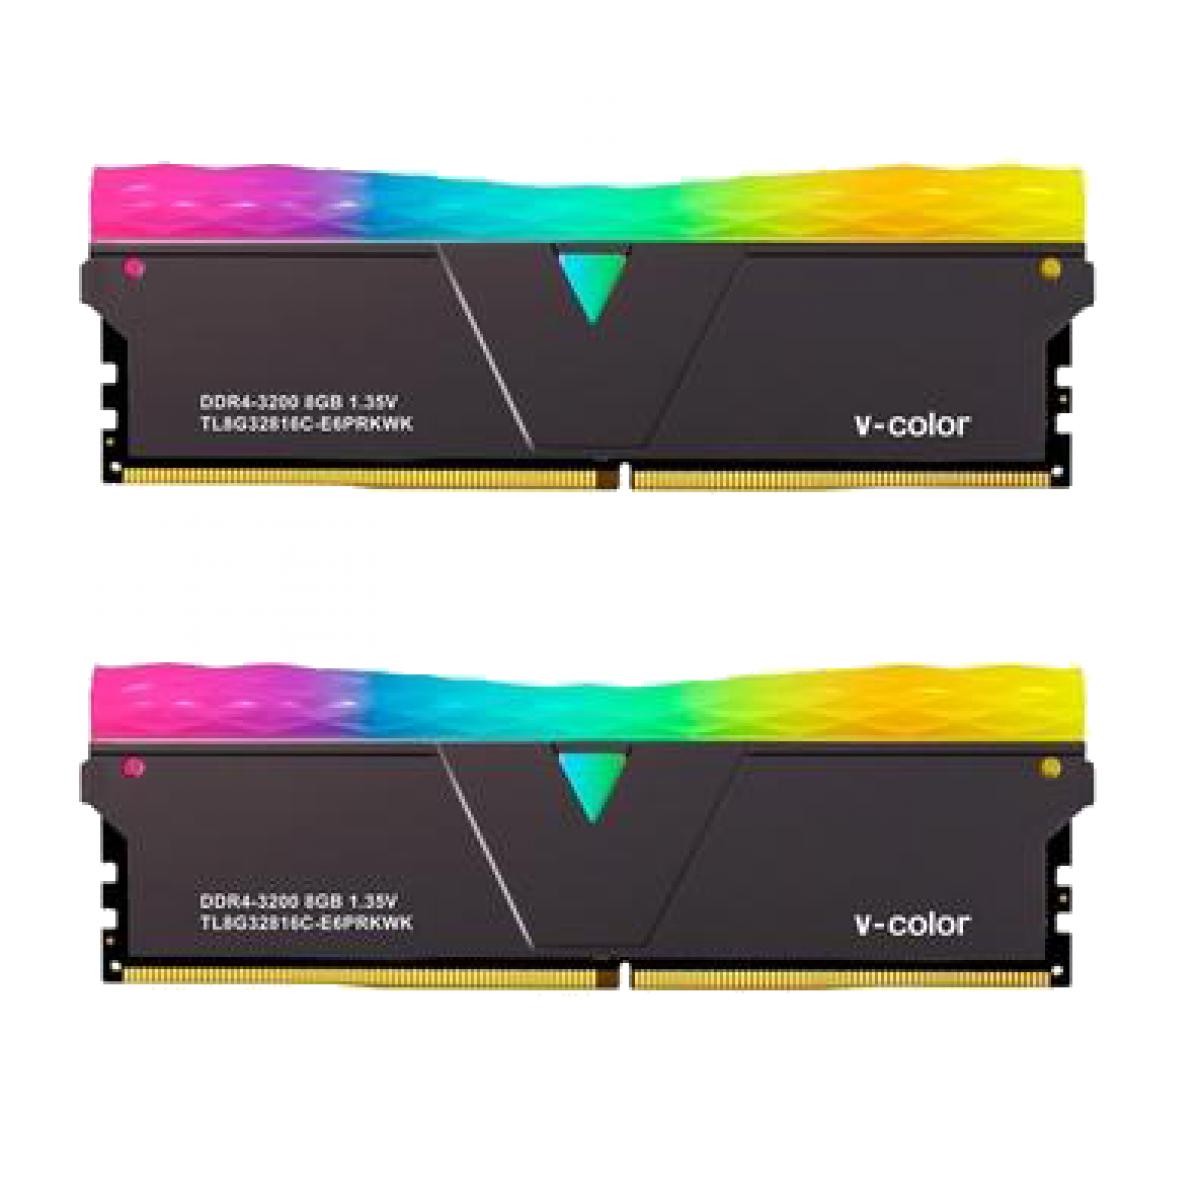 Memória DDR4 V-color PRISM PRO RGB 3600 U-dimm, 16GB, 3600MHZ, BLACK, TL16G36818A-E6PRAAK